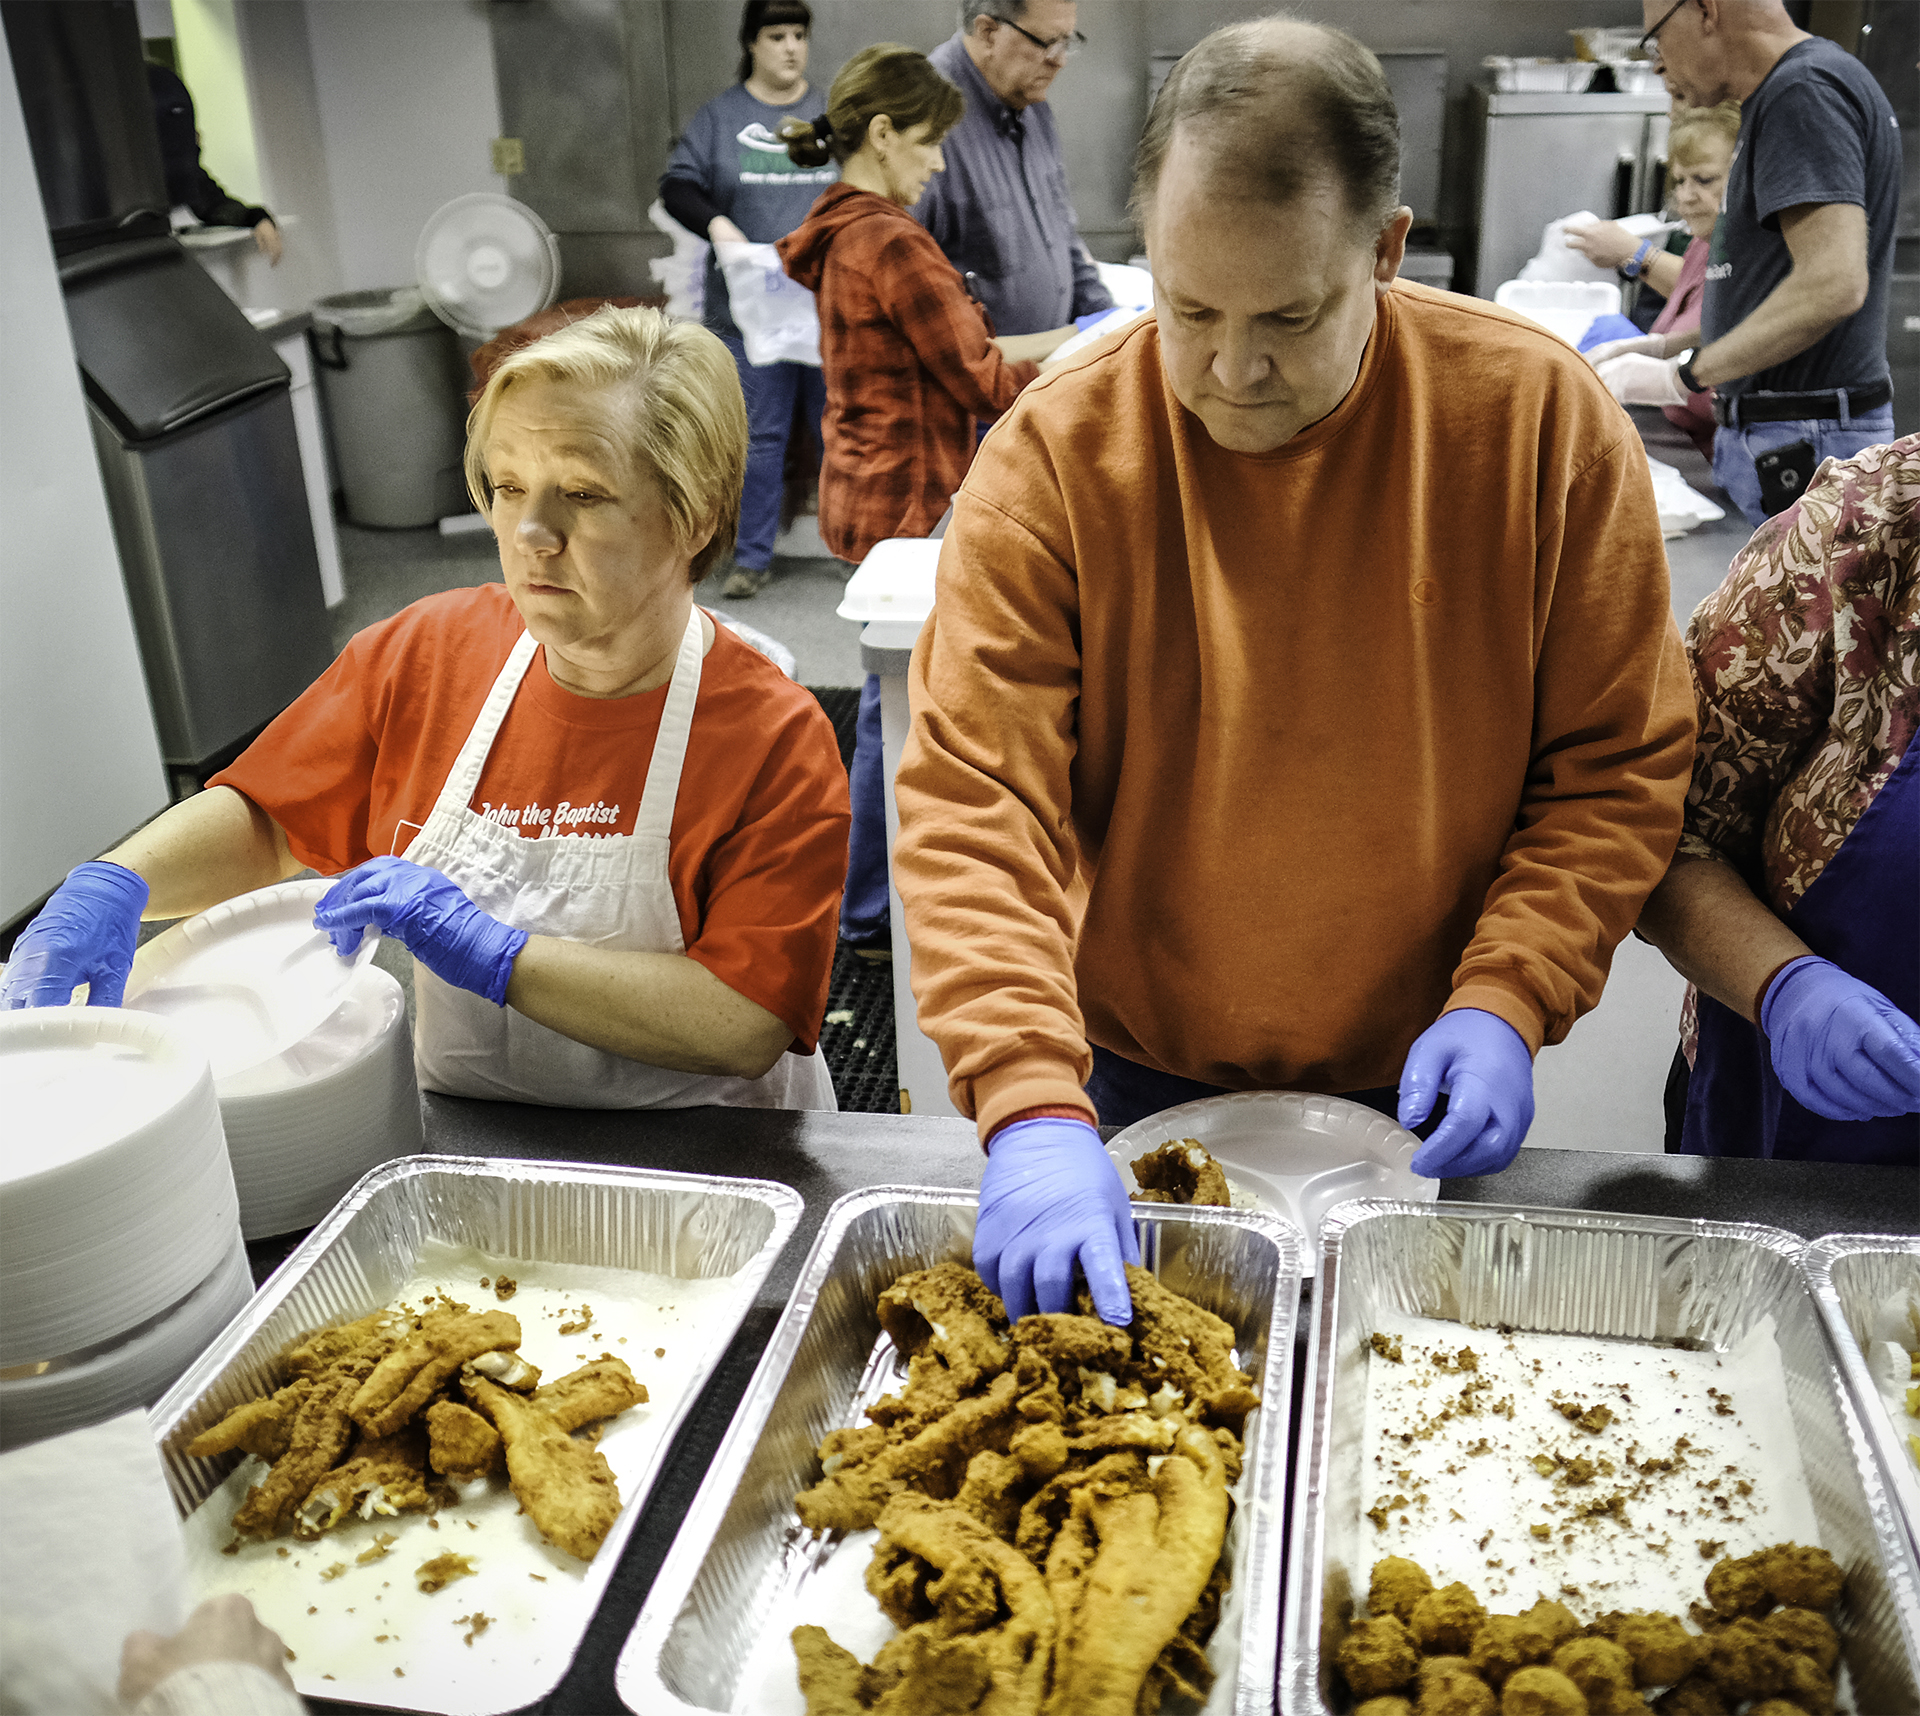 Wanda Worsley and Scott Dai serve up plates of fish.